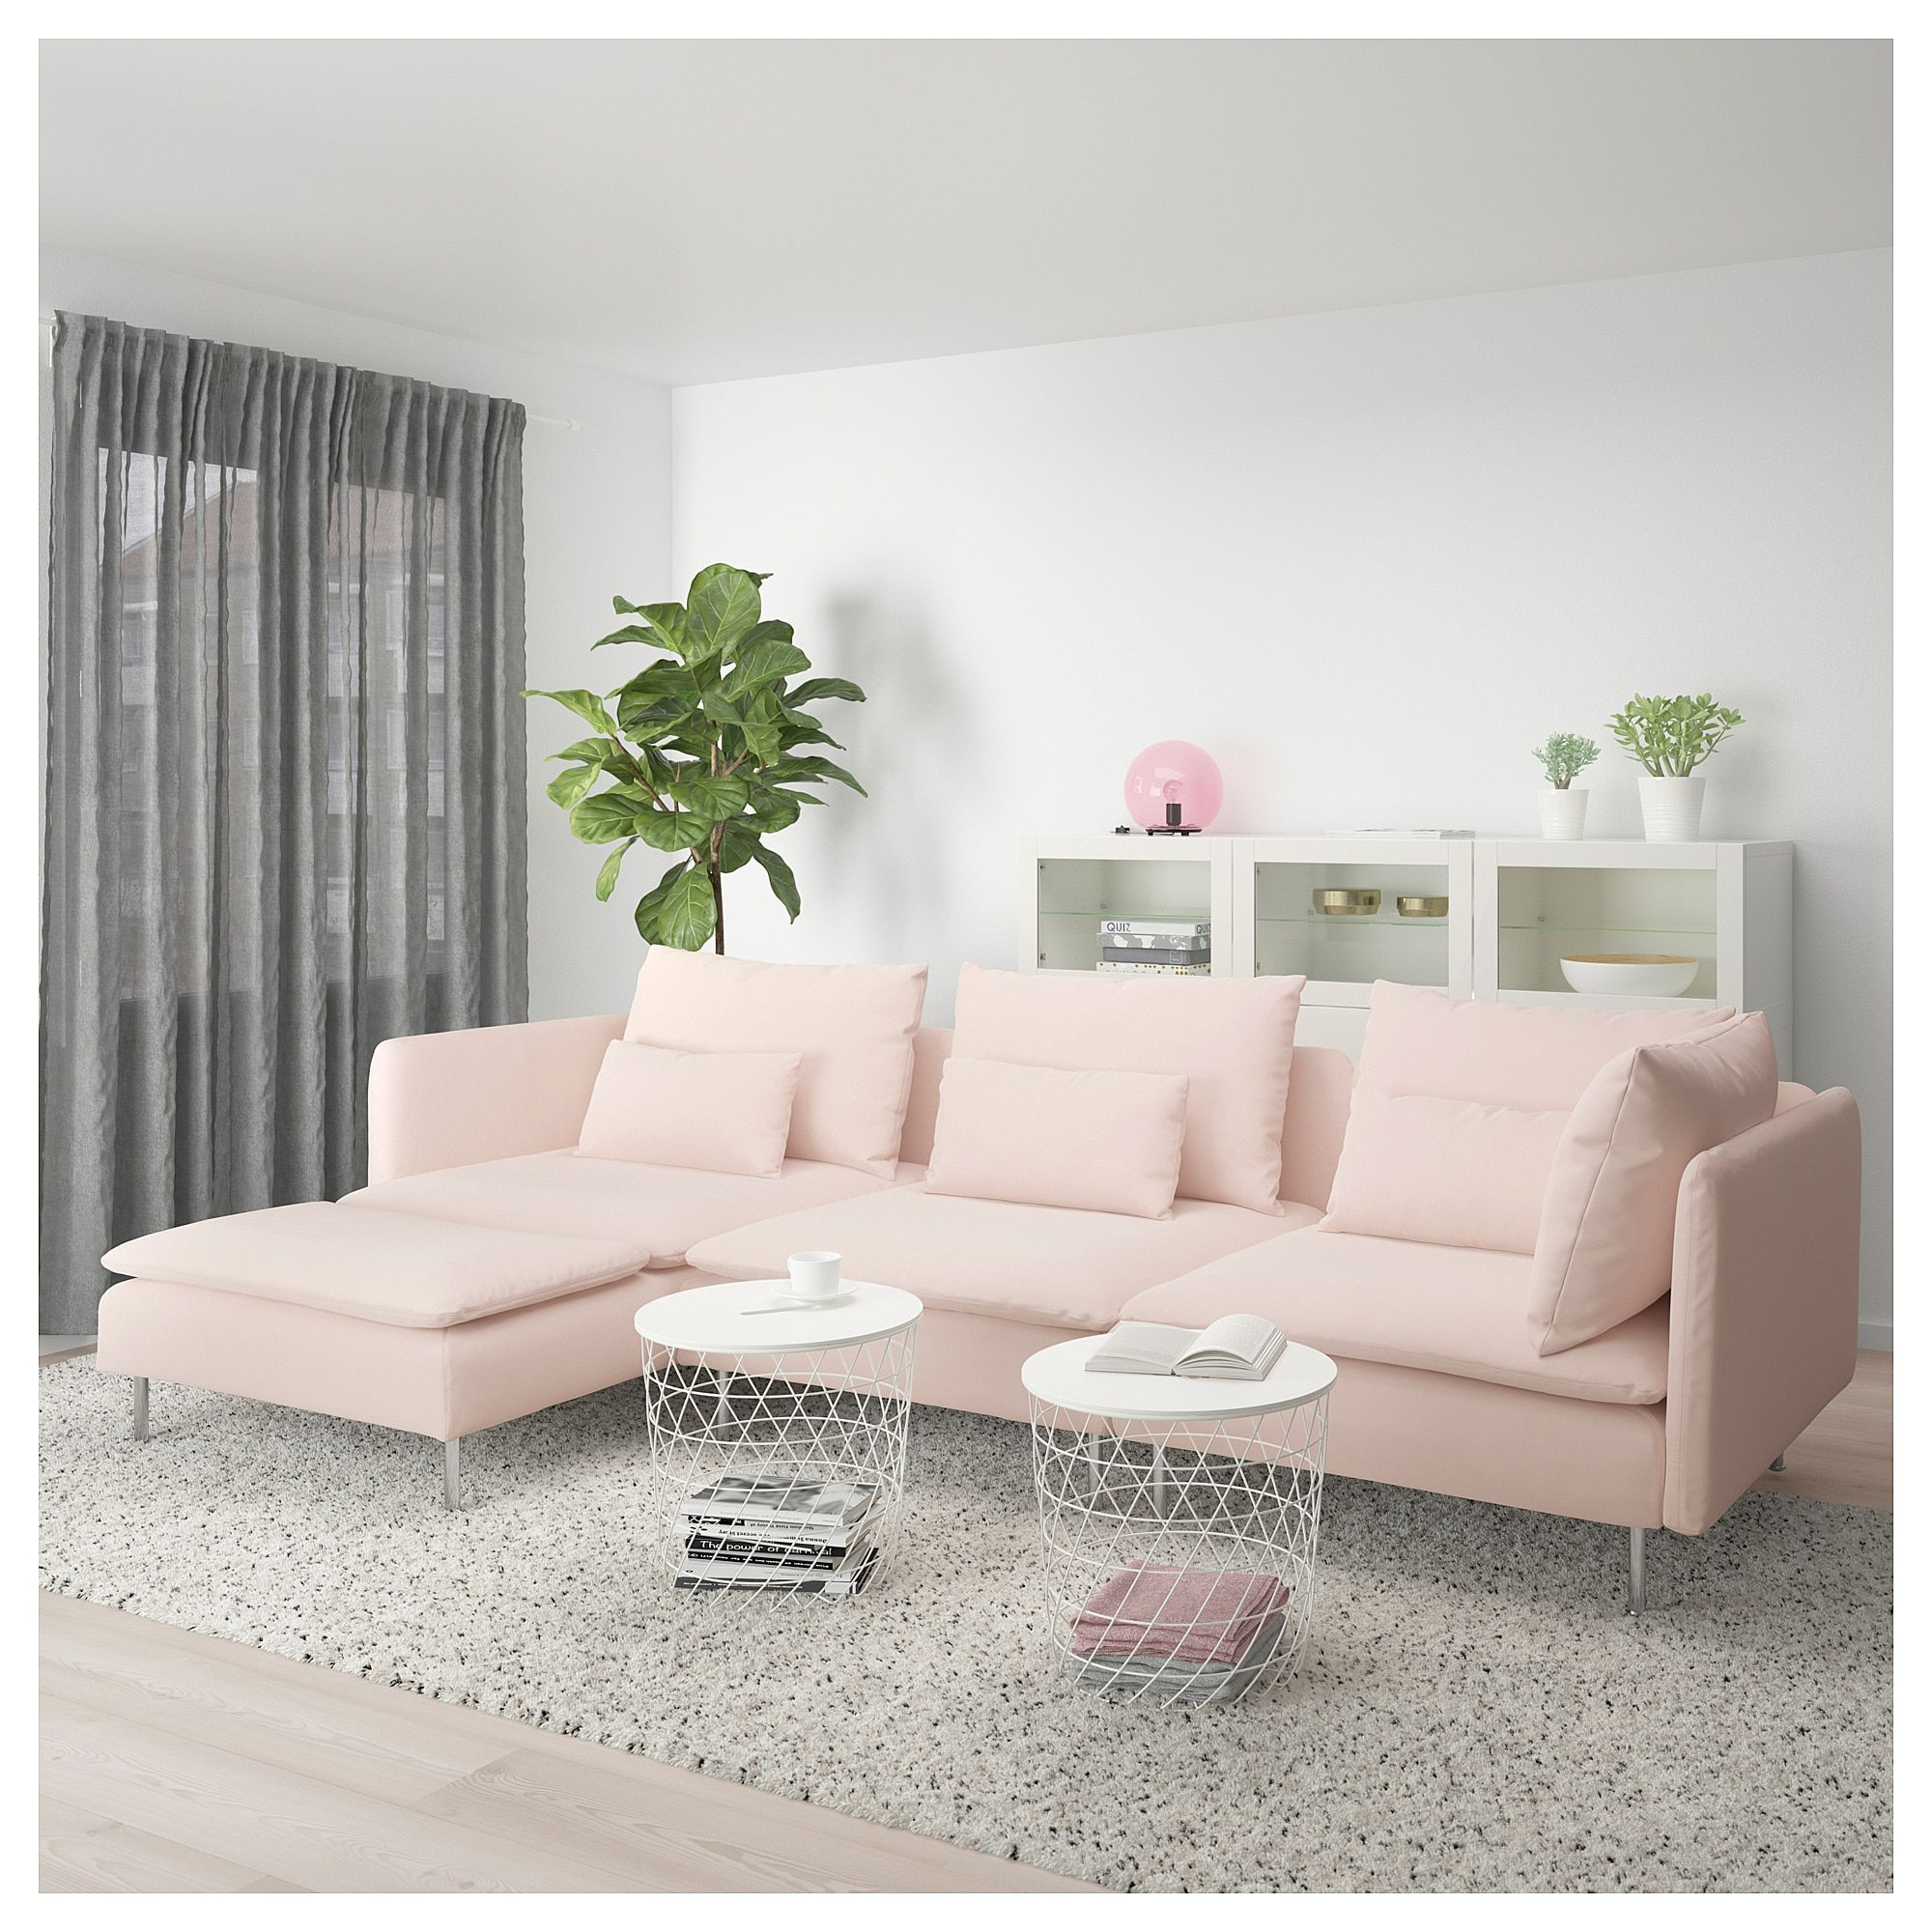 Soderhamn Ikea Hoekbank.Ikea Soderhamn Sectional 4 Seat With Chaise Samsta Light Pink